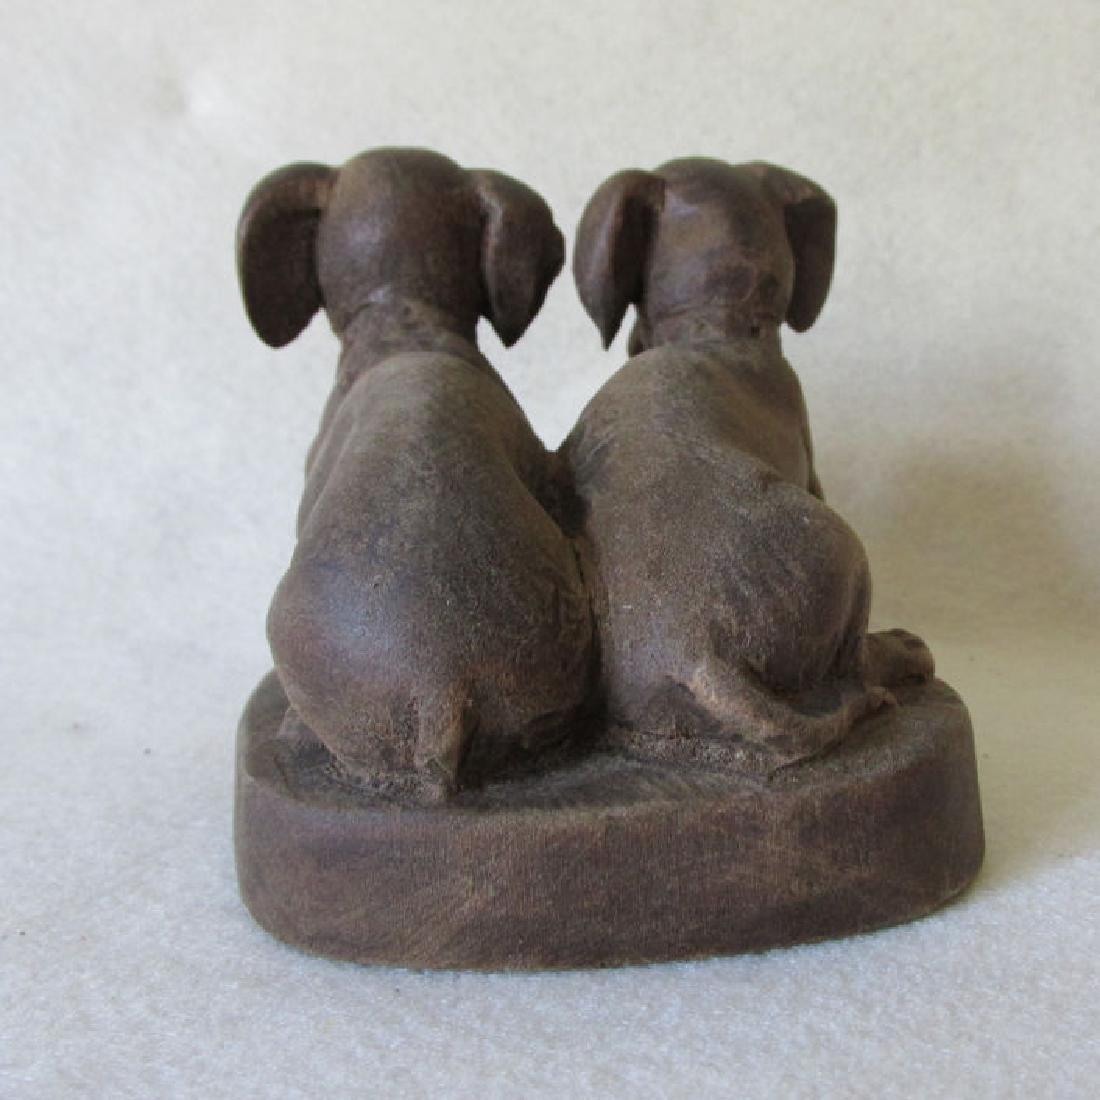 Vintage Folk Art Wood Carving of Dachshund Dogs - 3